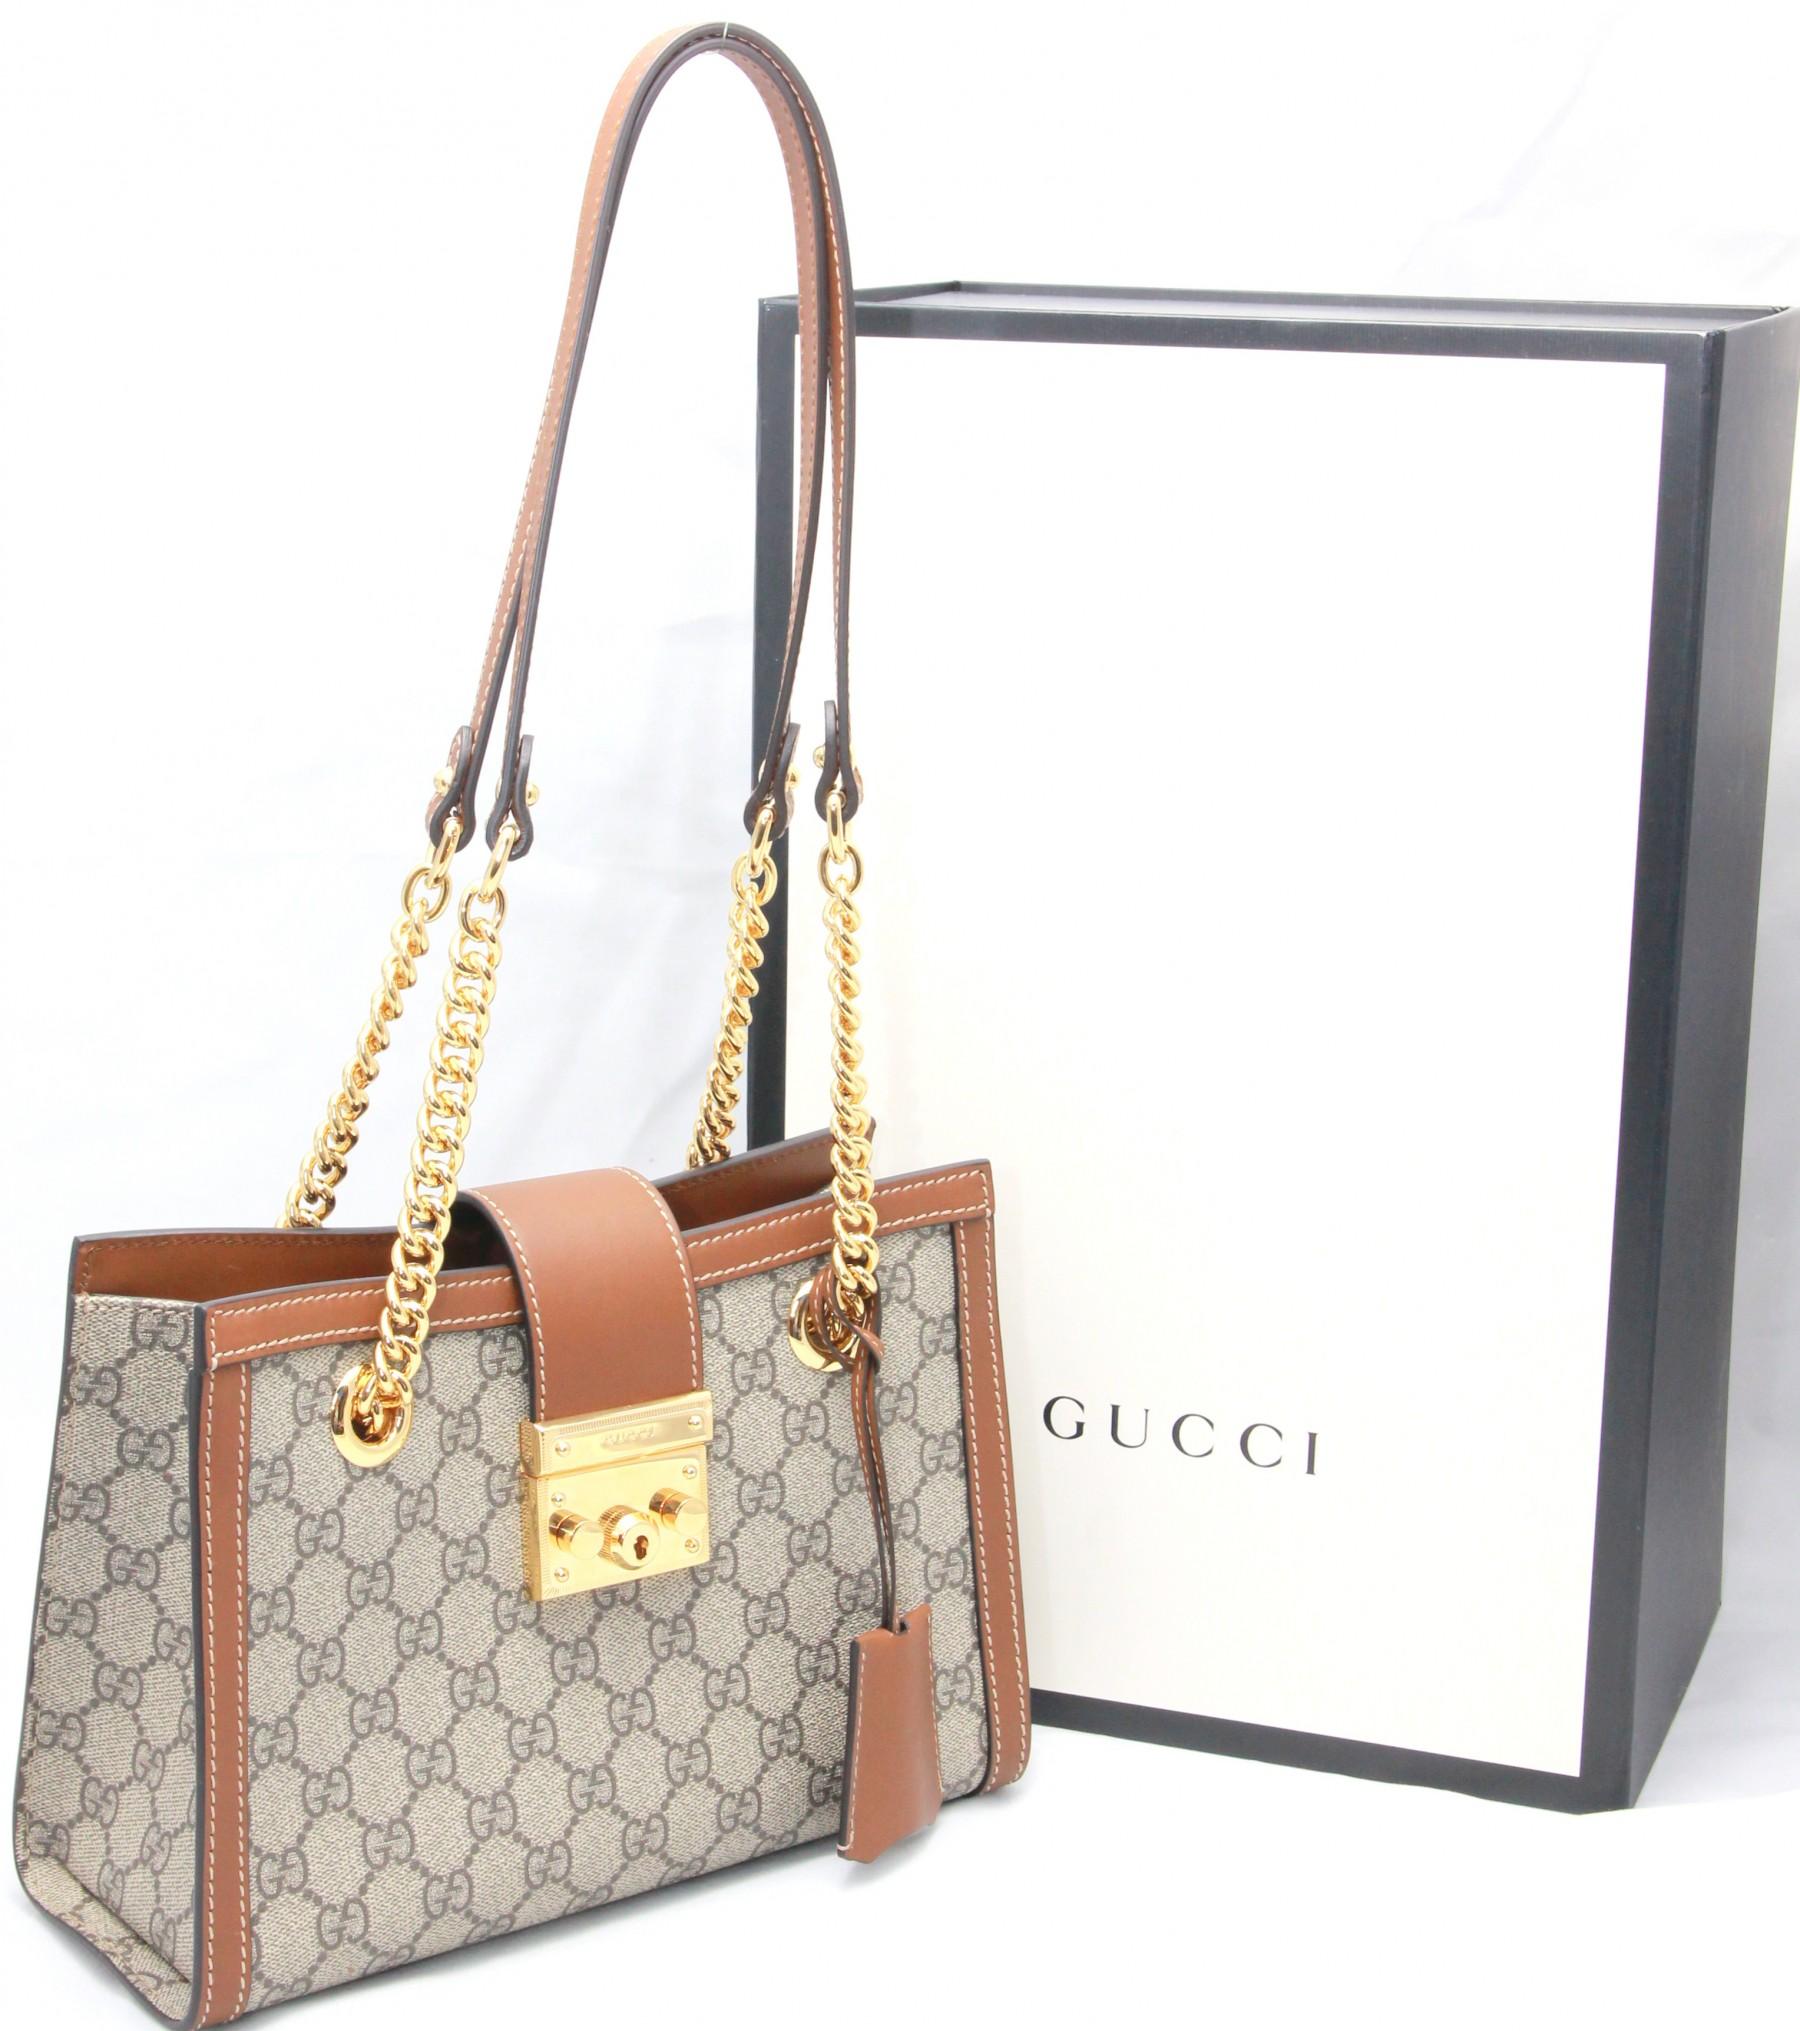 40a2f48cb Sold ! GUCCI Padlock Small Gg Supreme Canvas Shoulder Bag in Neutrals